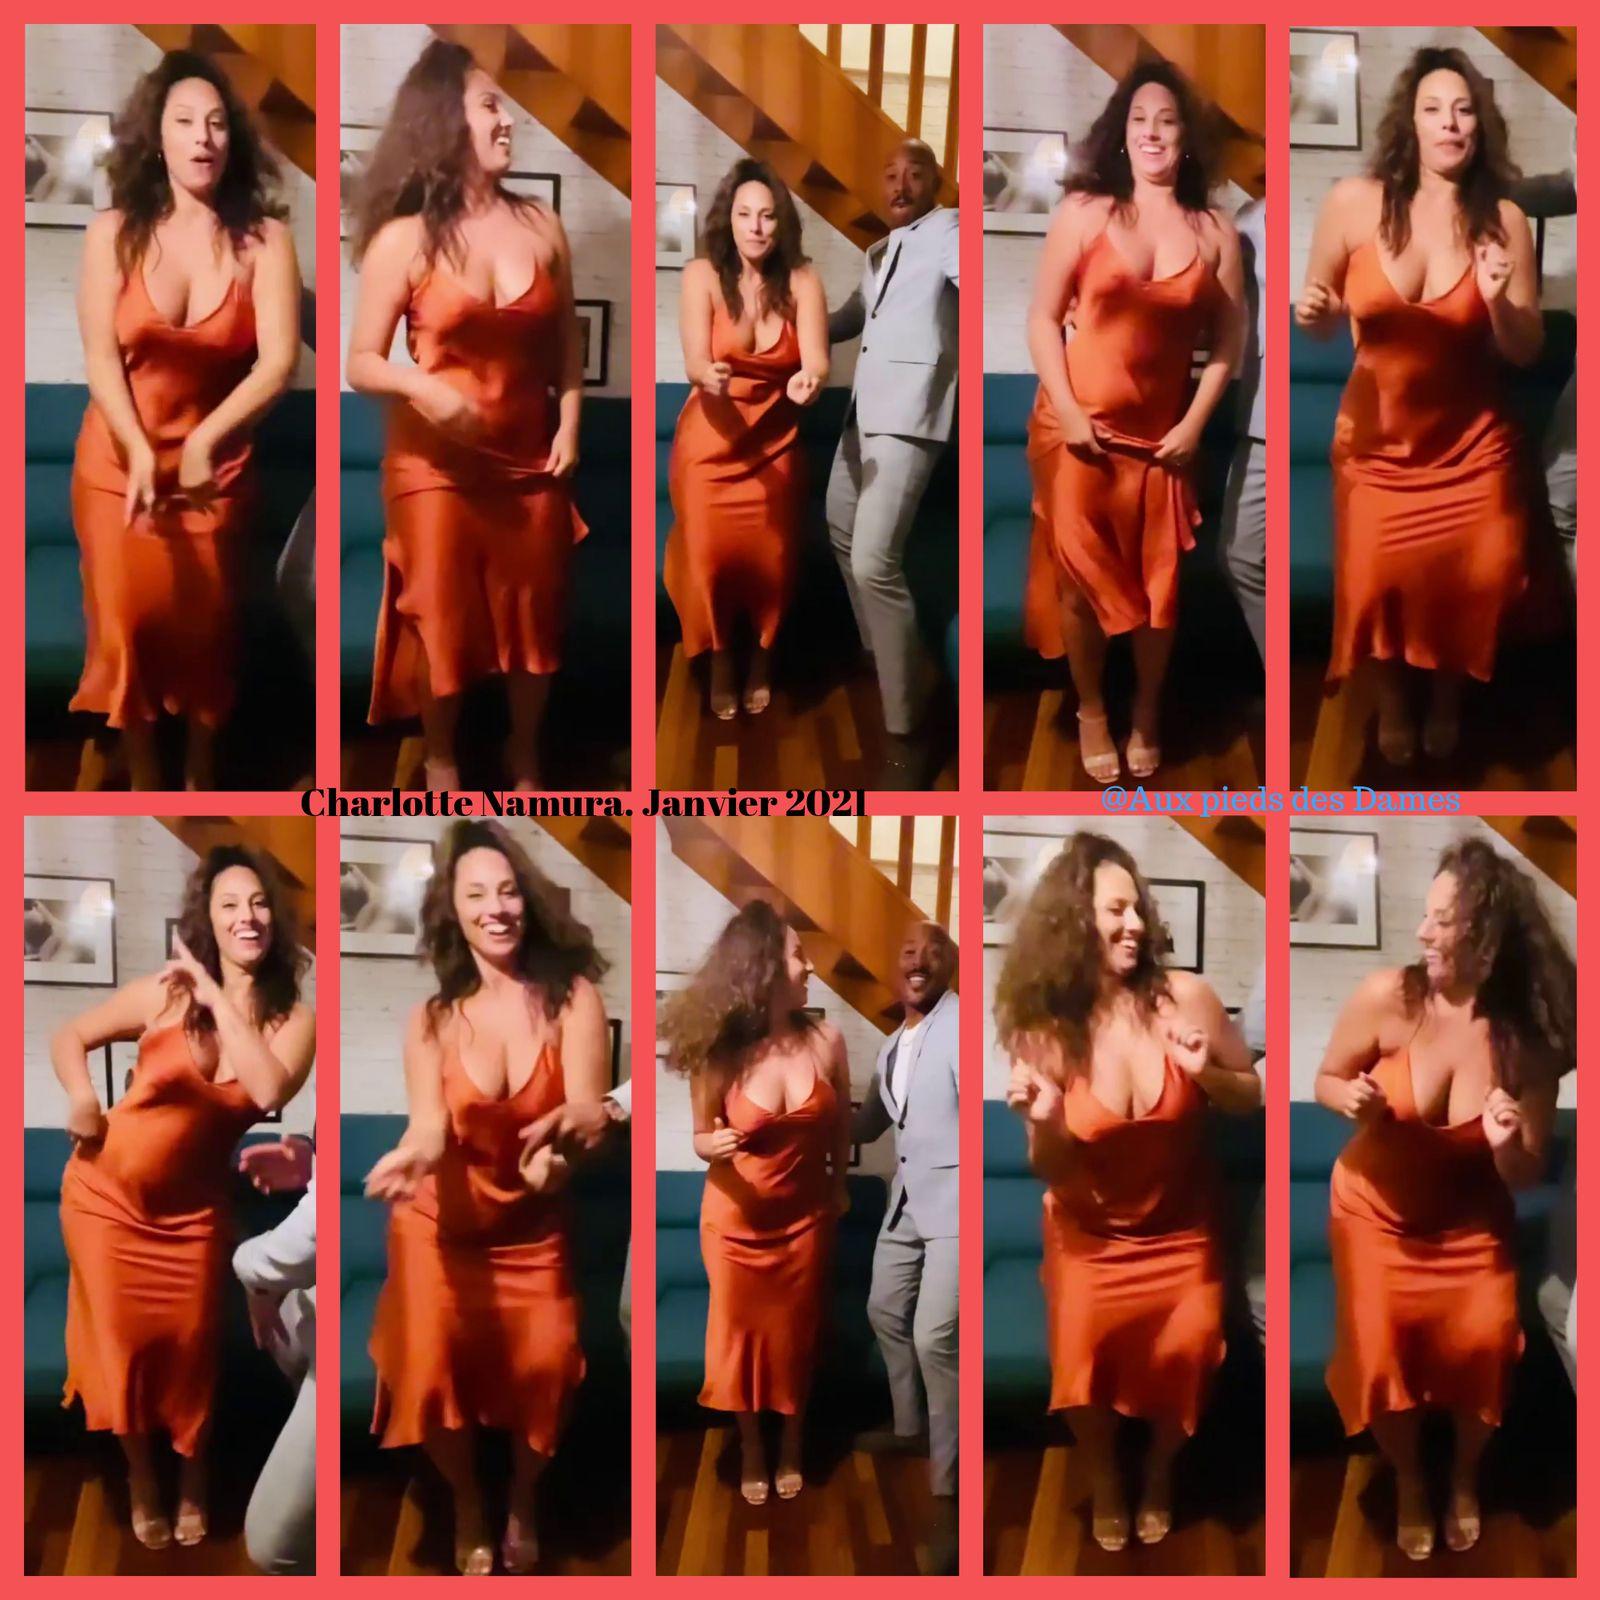 Charlotte Namura le 24 janvier 2021. Danse sur Instagram